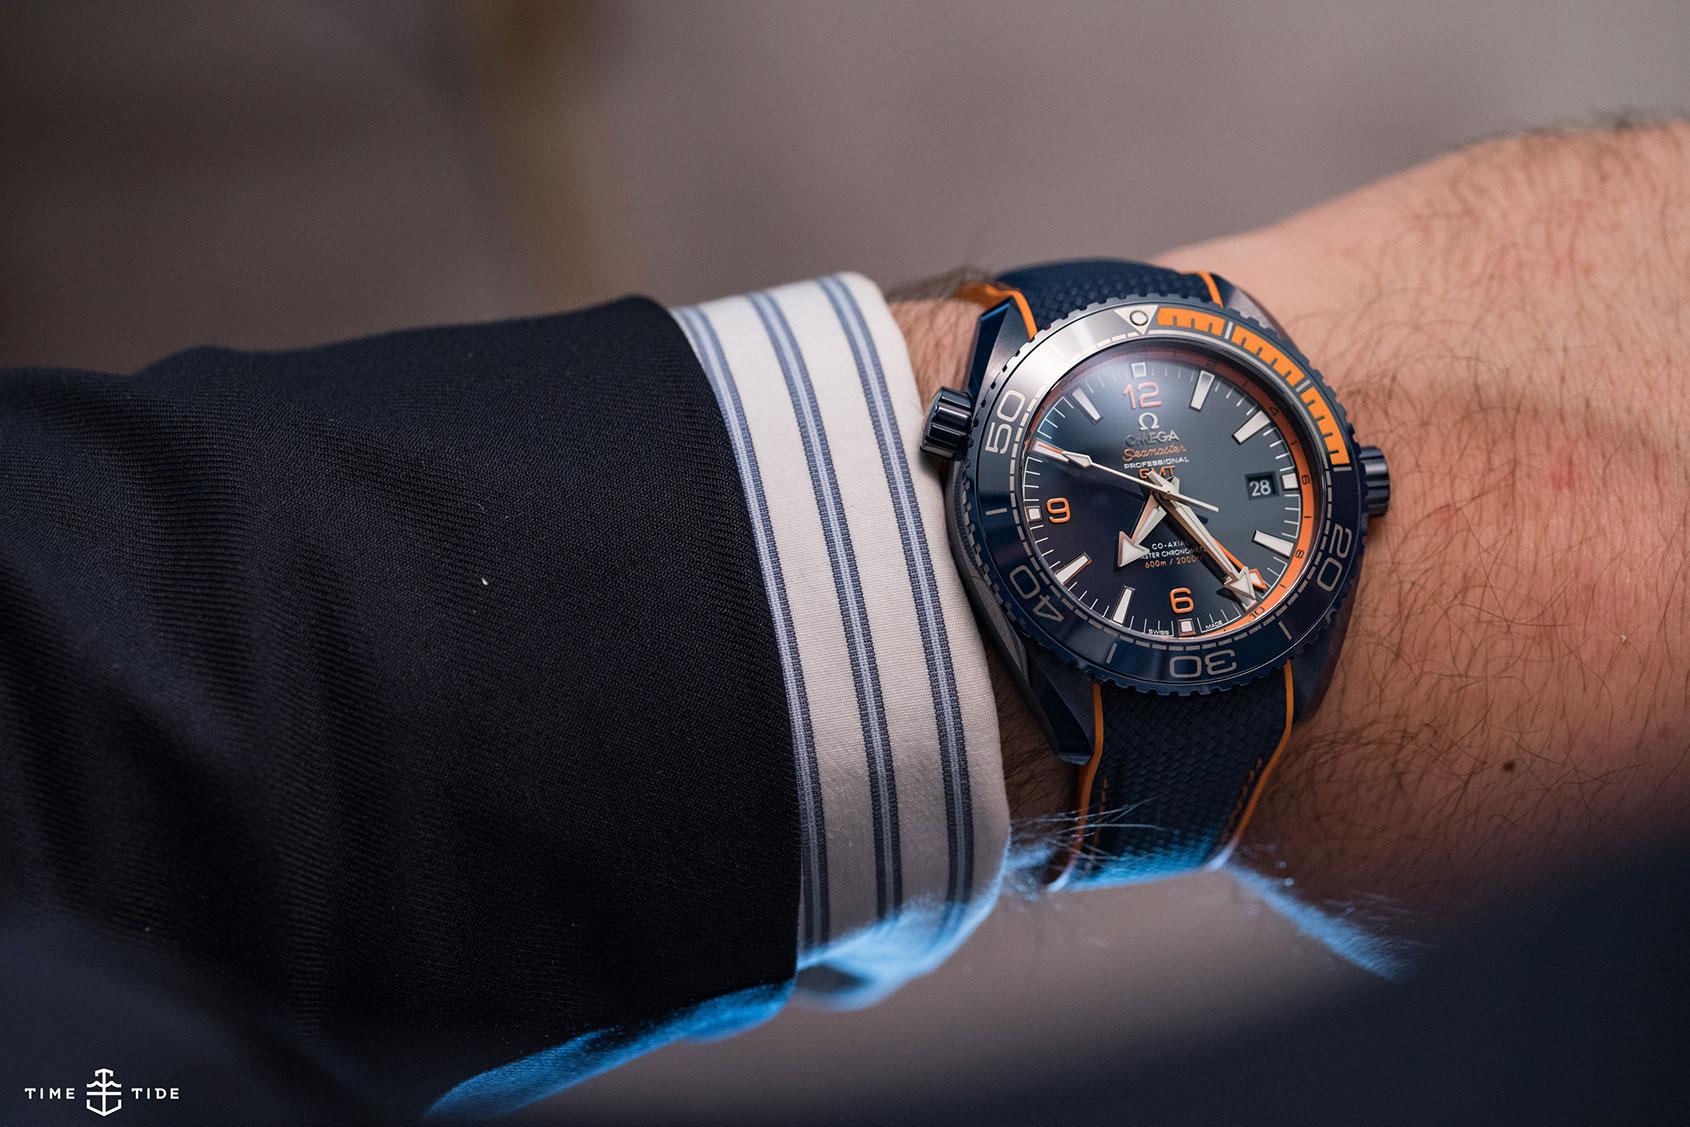 Hands On The Omega Seamaster Planet Ocean Big Blue